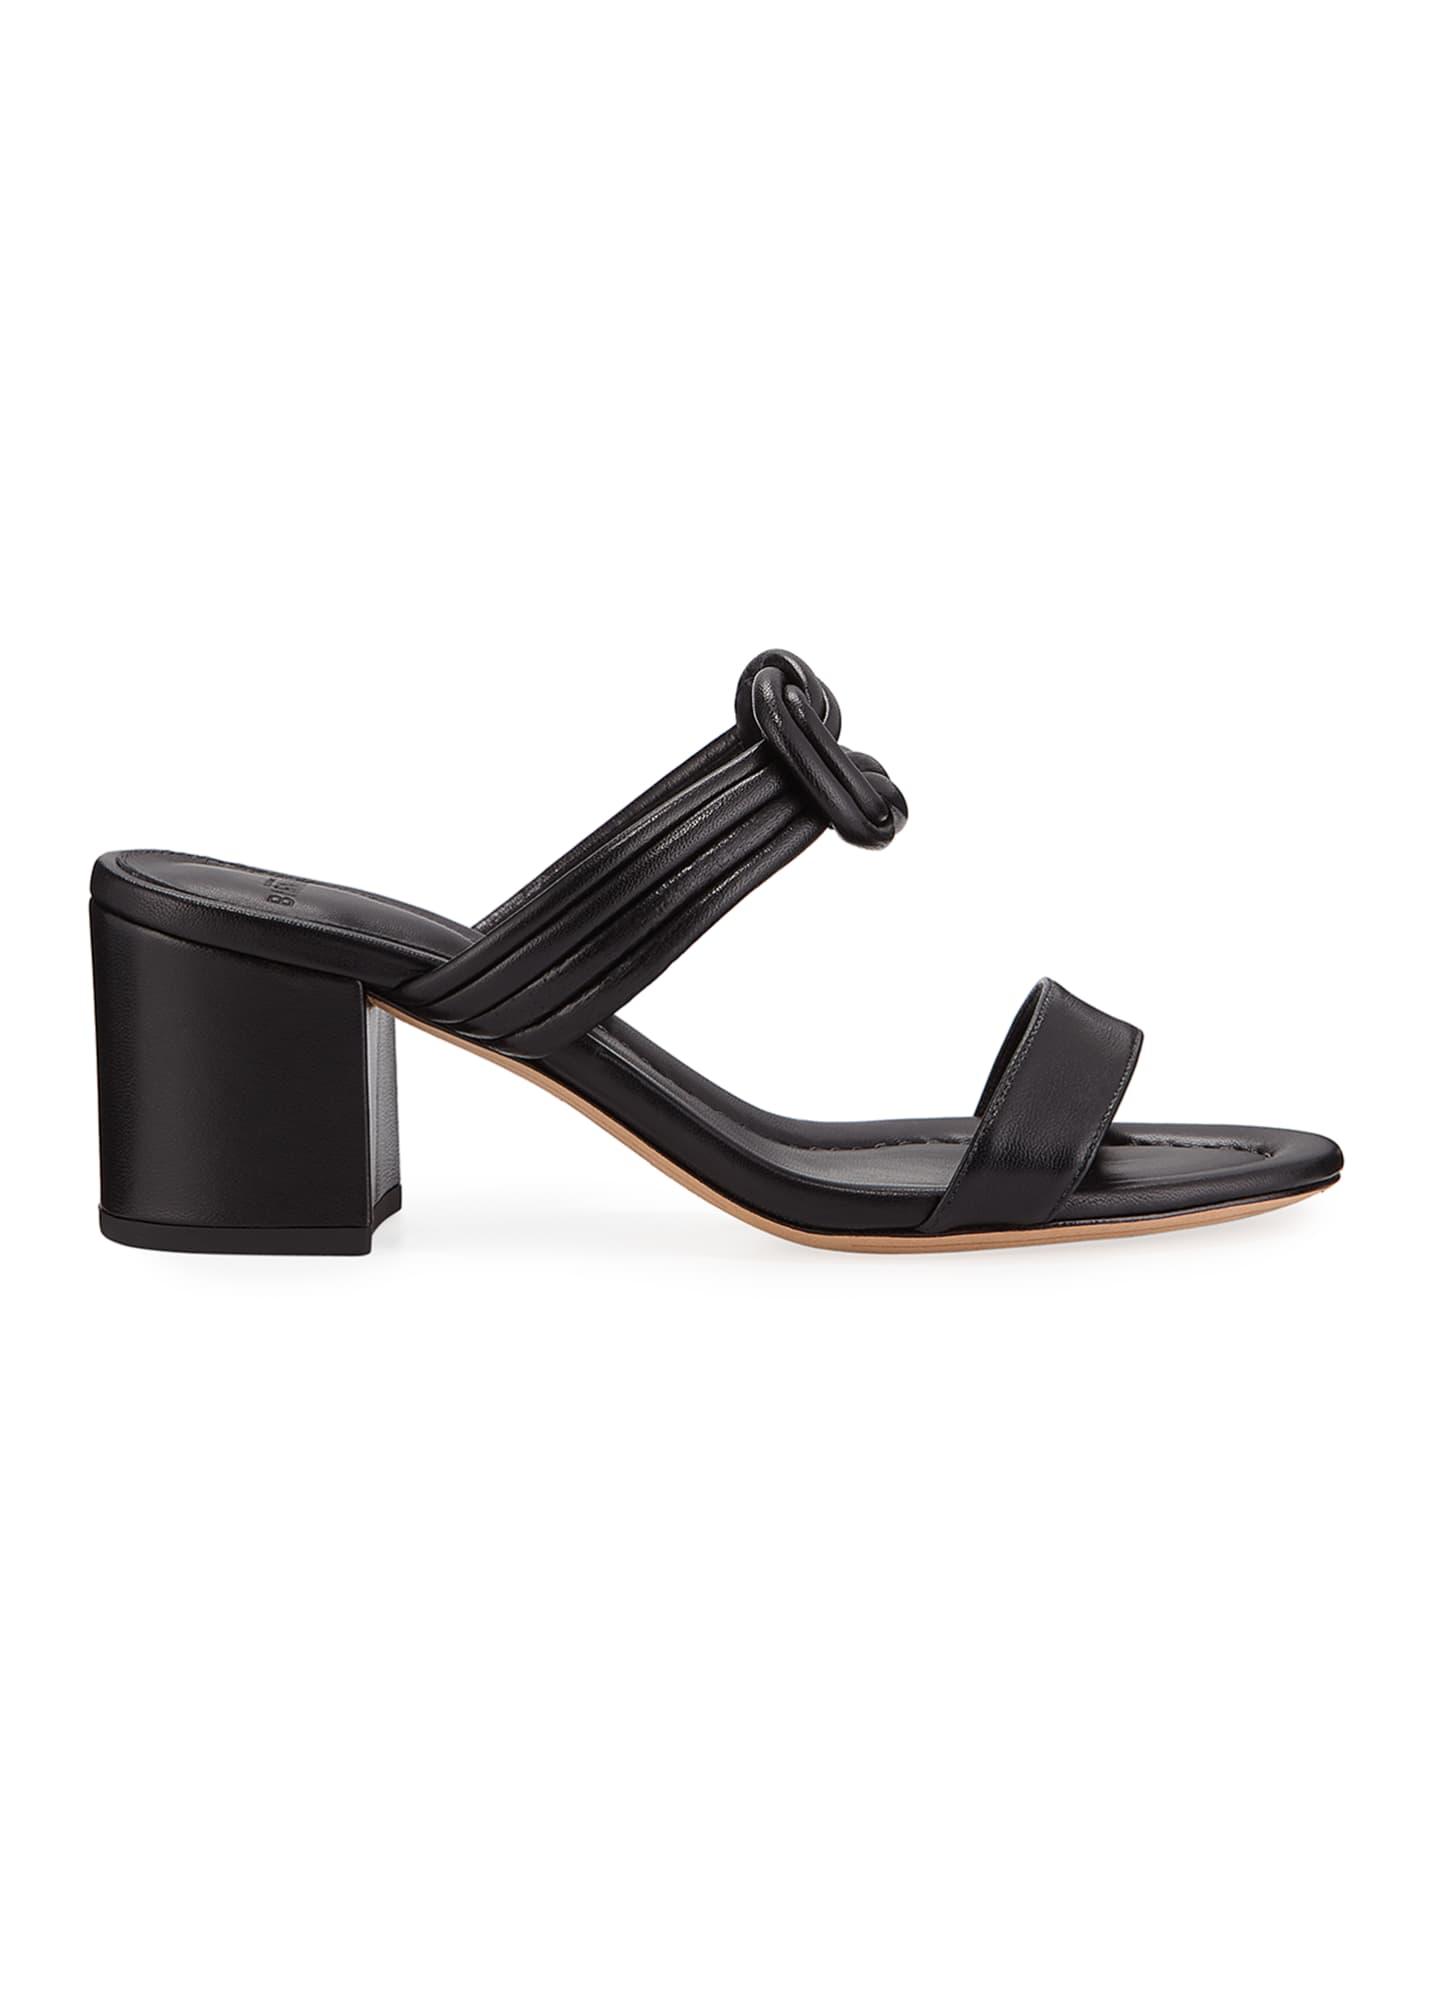 Alexandre Birman Vicky Knotted Leather Block-Heel Sandals